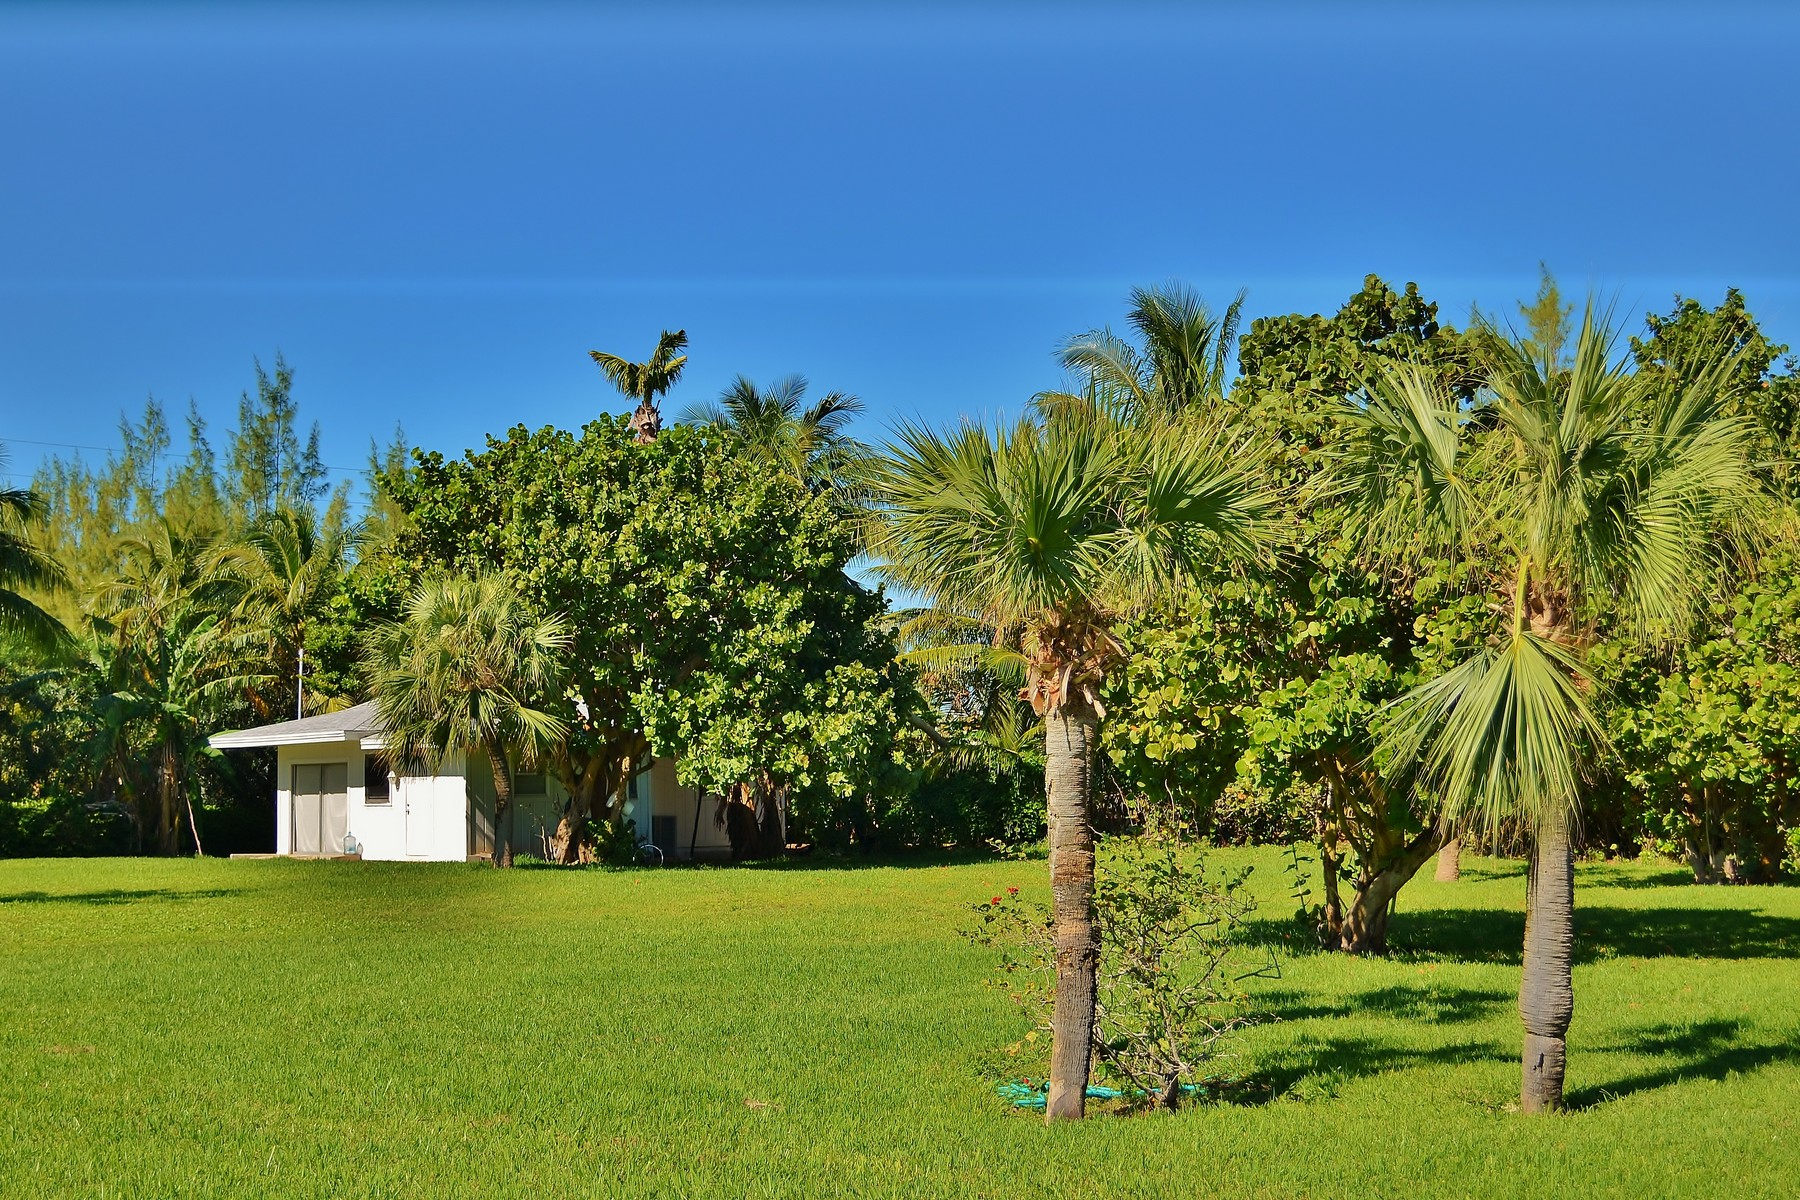 独户住宅 为 销售 在 Serenity Lot Treasure Cay, 阿巴科 巴哈马